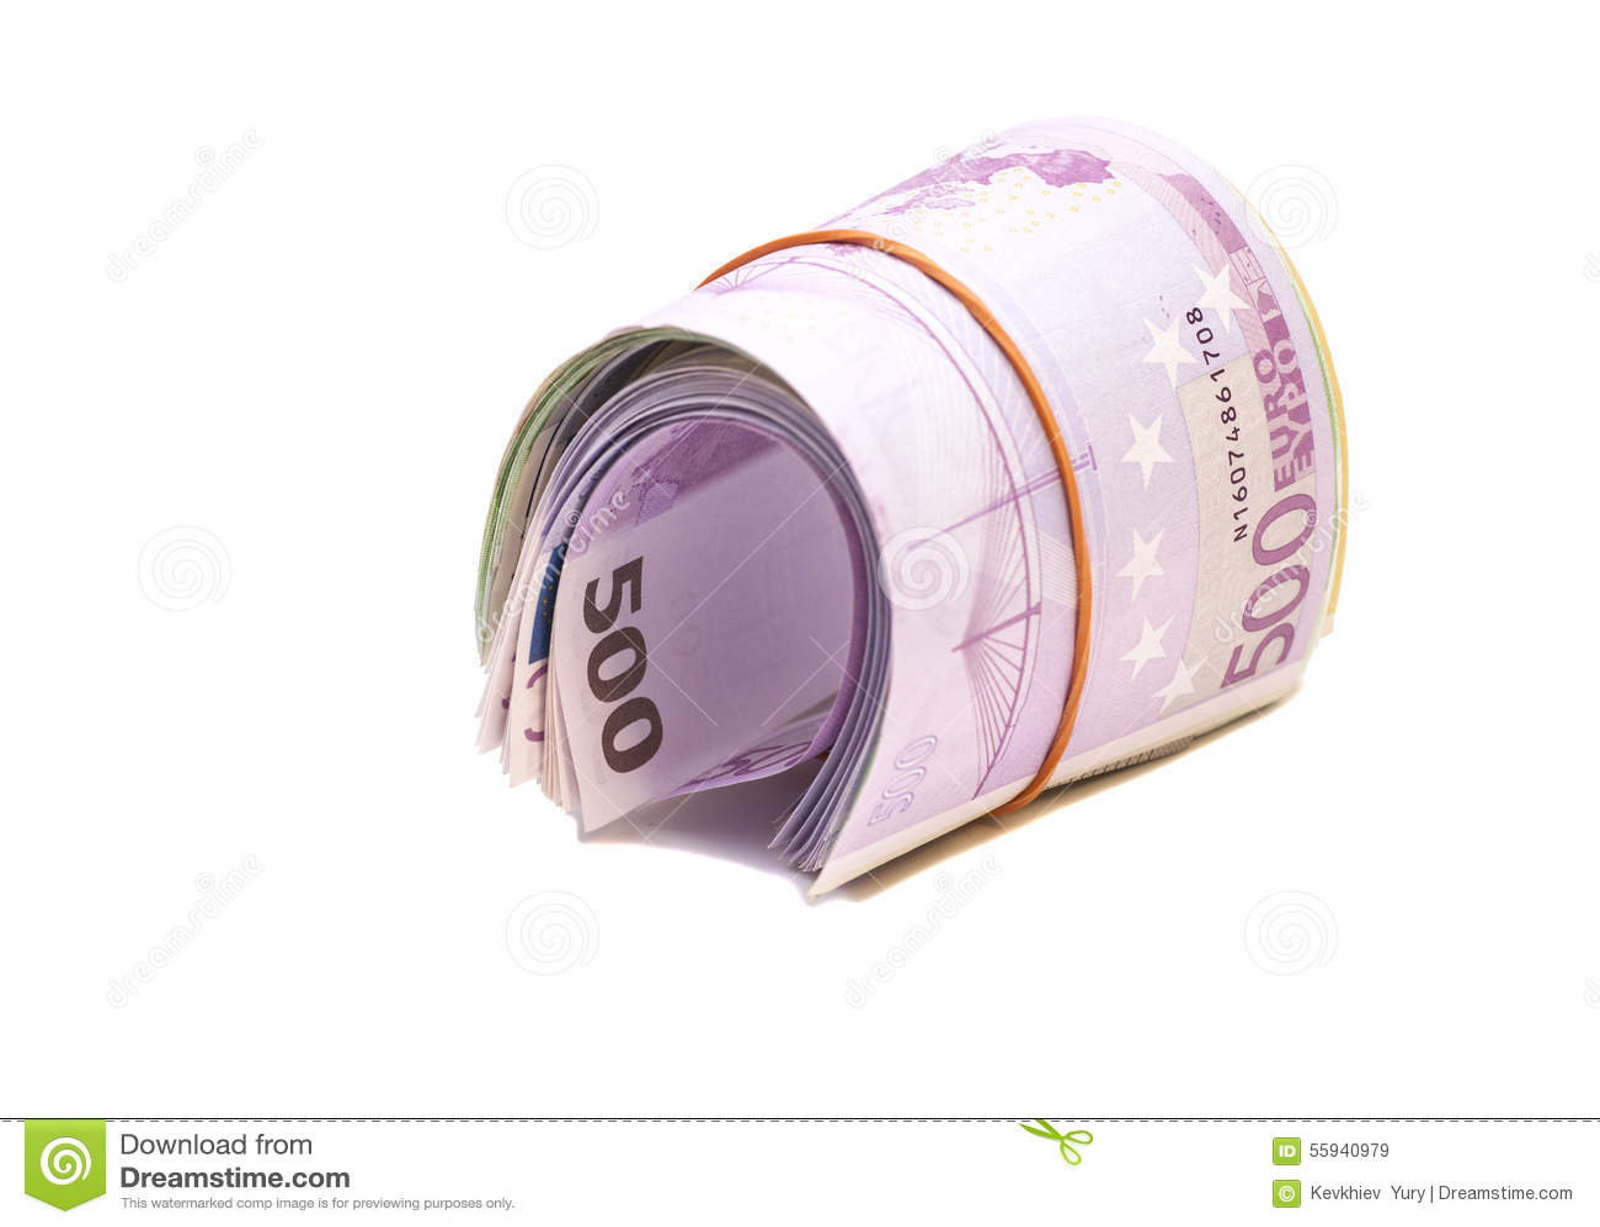 5 сотых банкнот евро под круглой резинкой